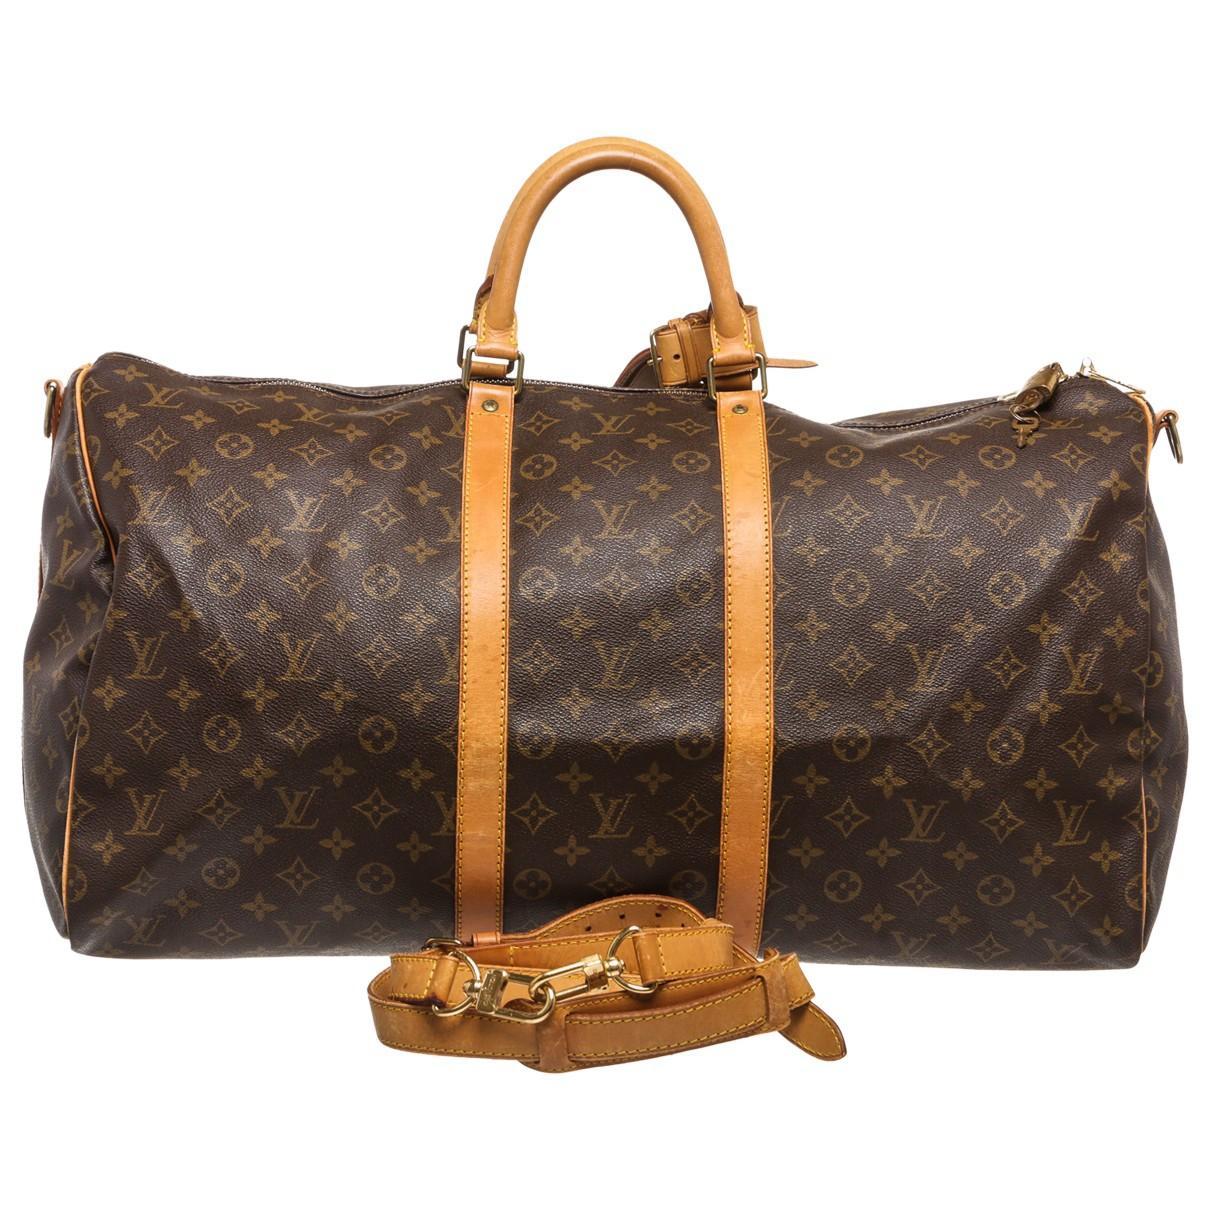 Authentic Pre Owned Designer Bags Uk